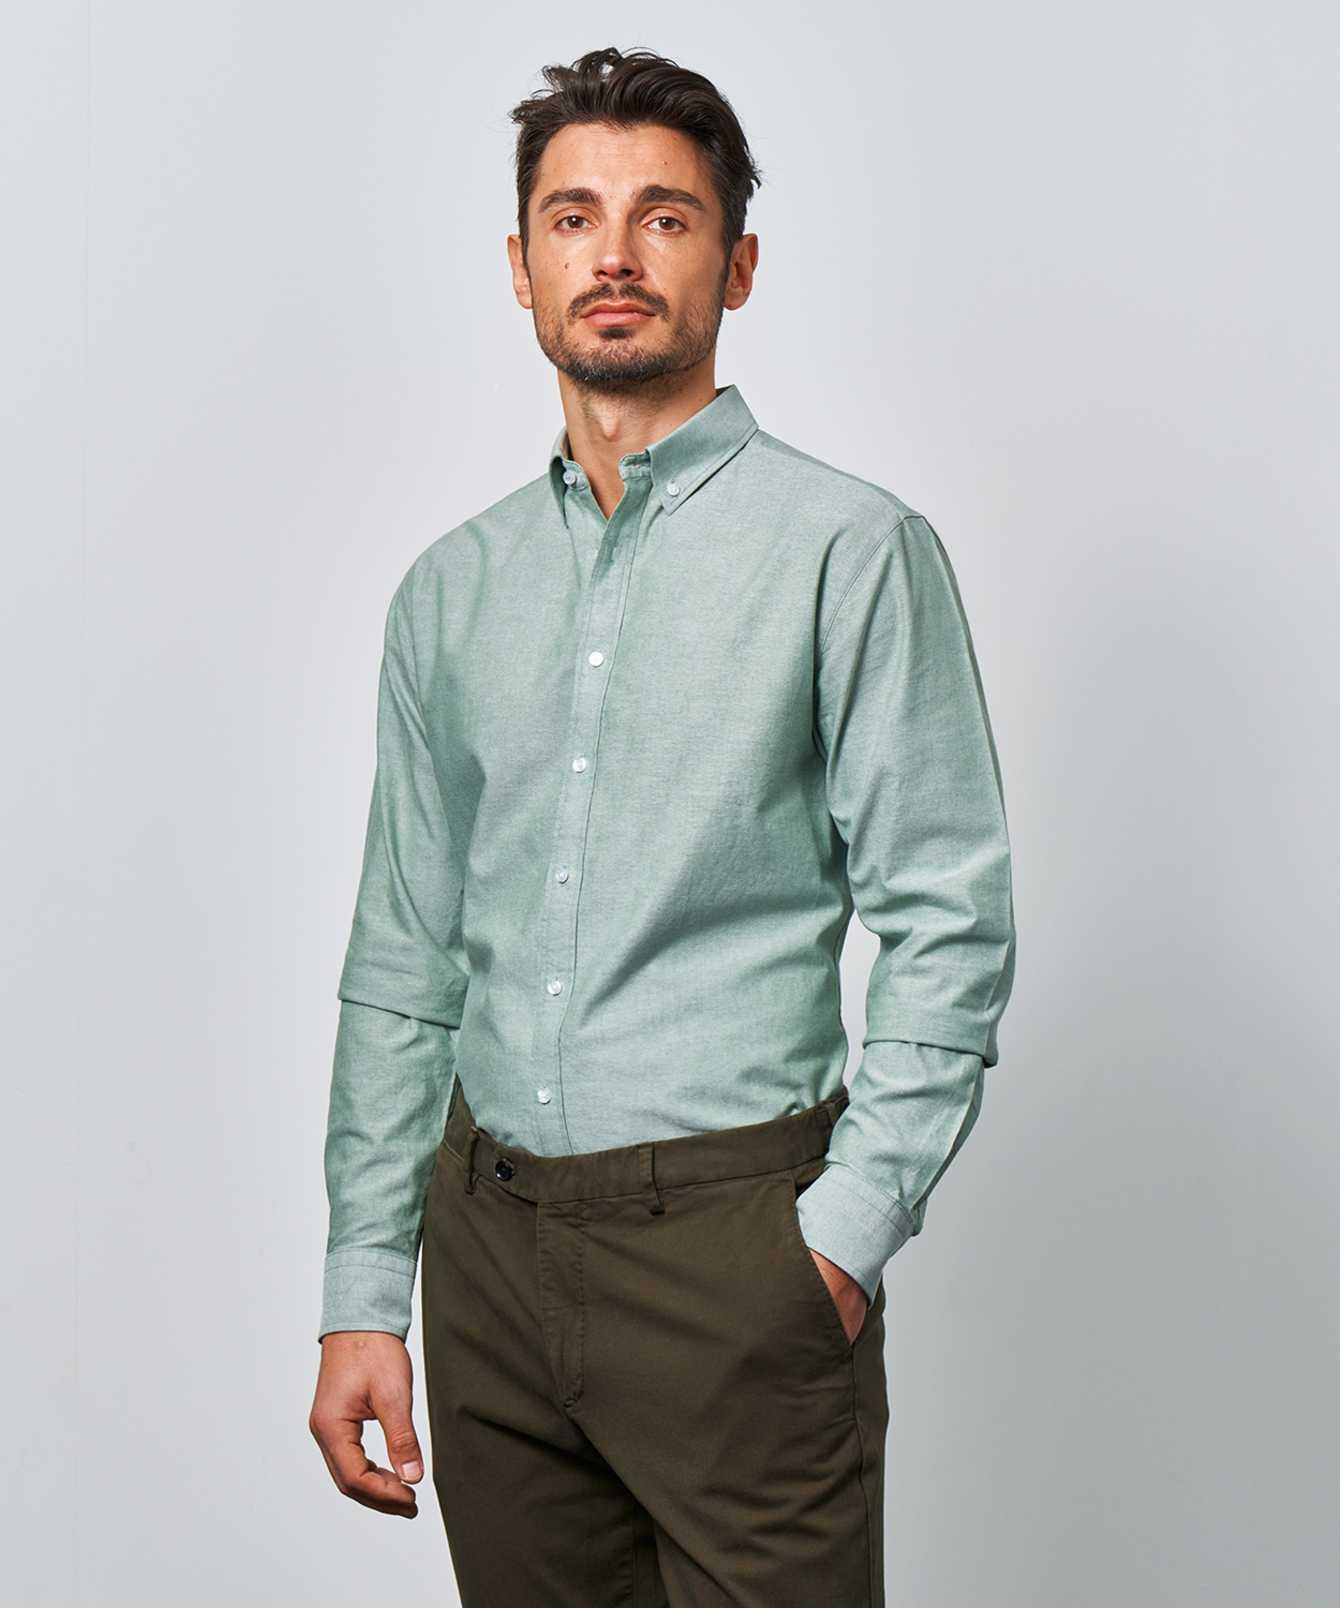 Shirt Hampton Oxford Green The Shirt Factory